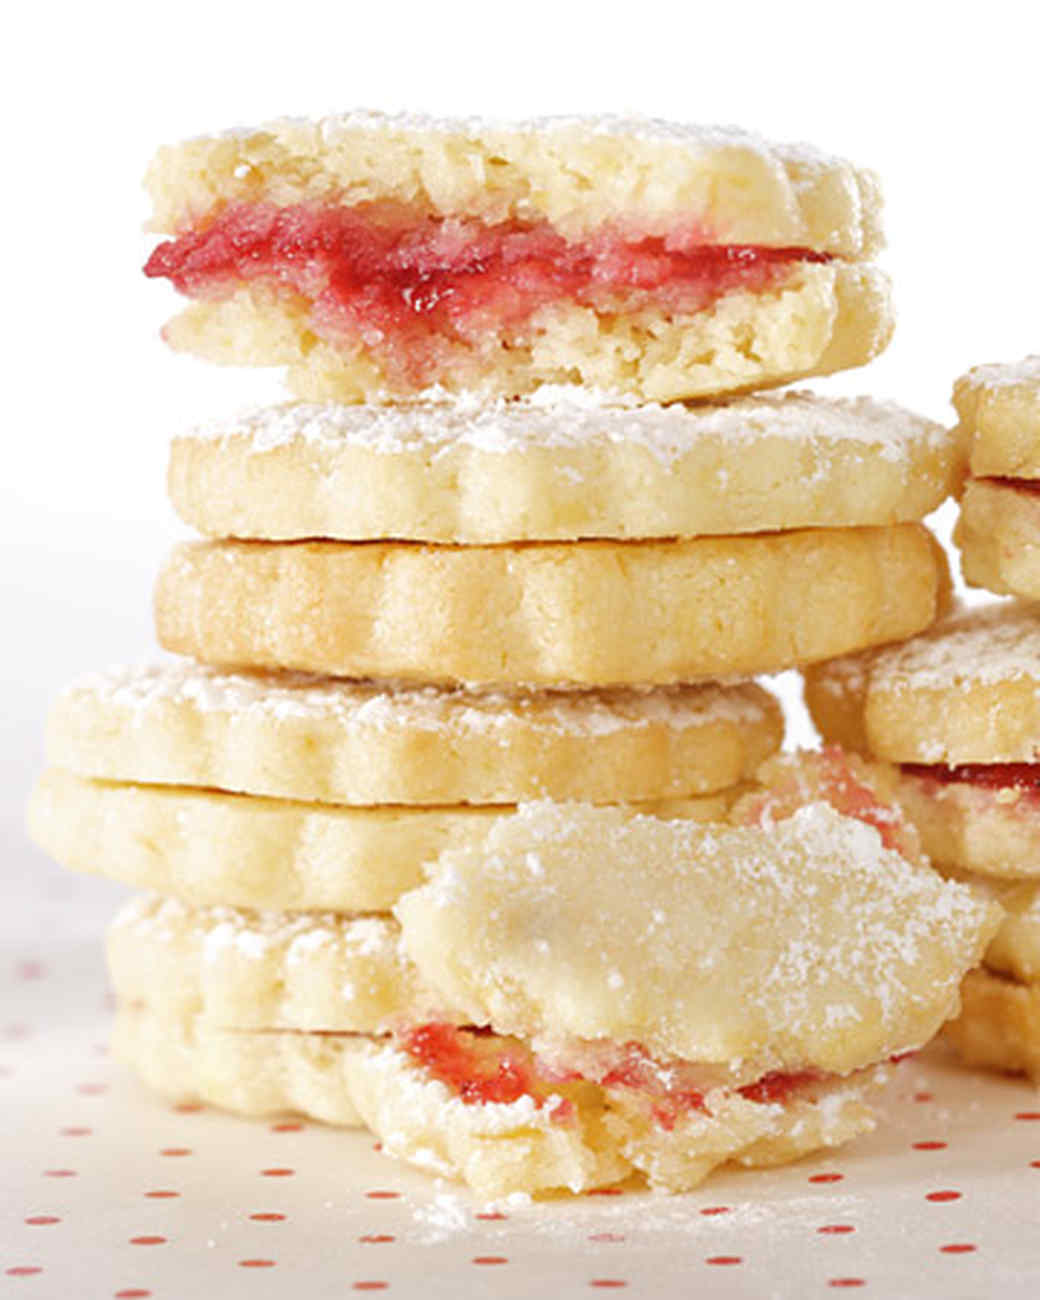 4062_121208_sandwichcookies.jpg